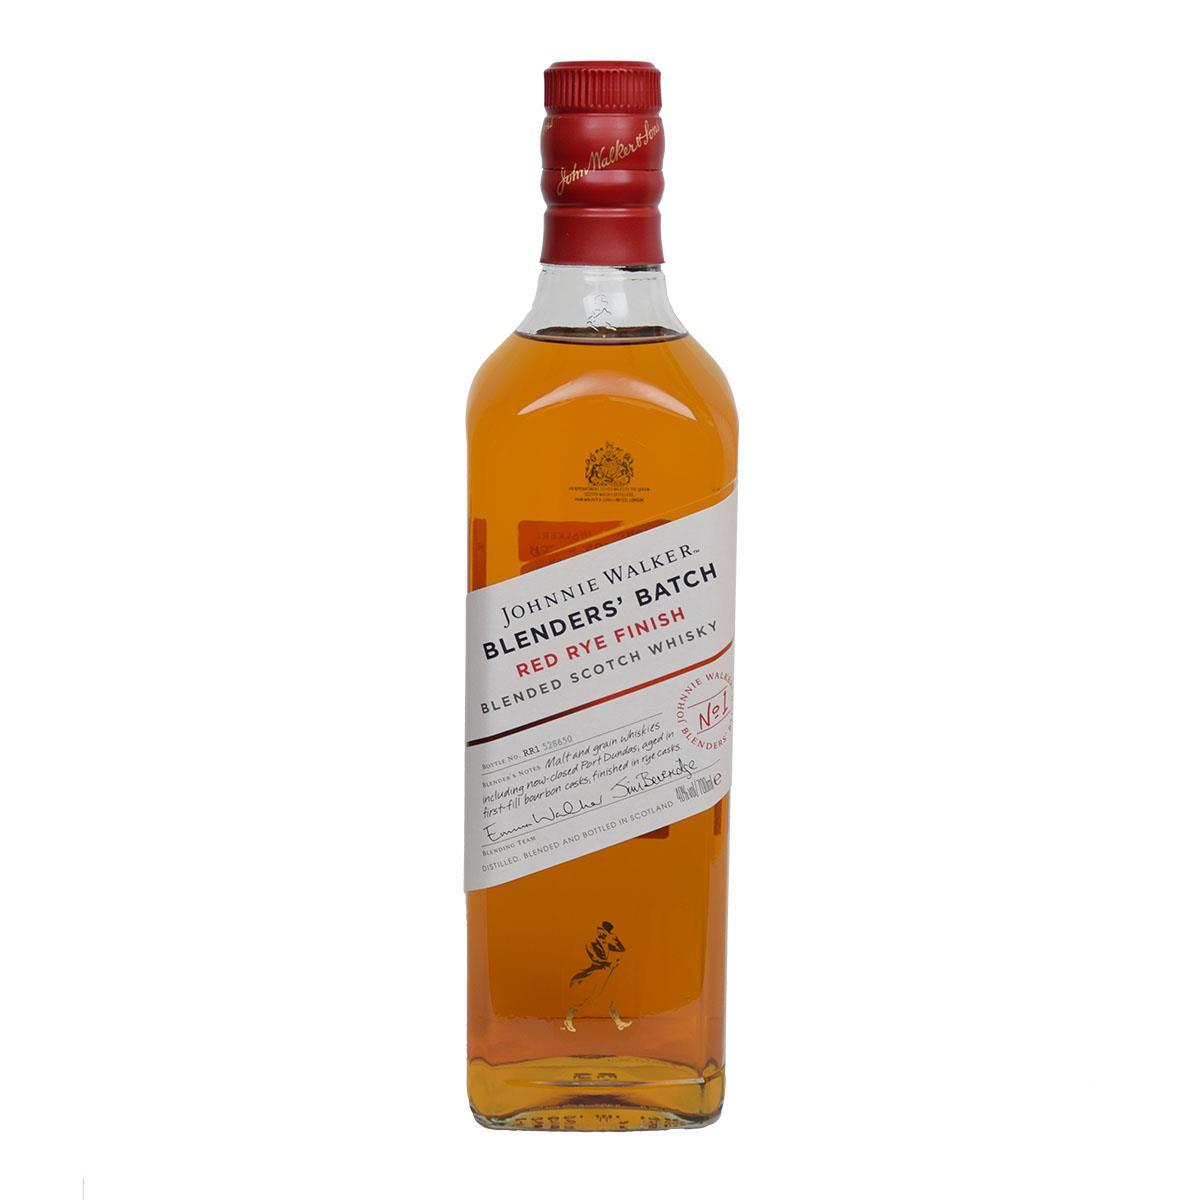 Johnnie Walker Blenders Batch Red Rye Finish 700ml